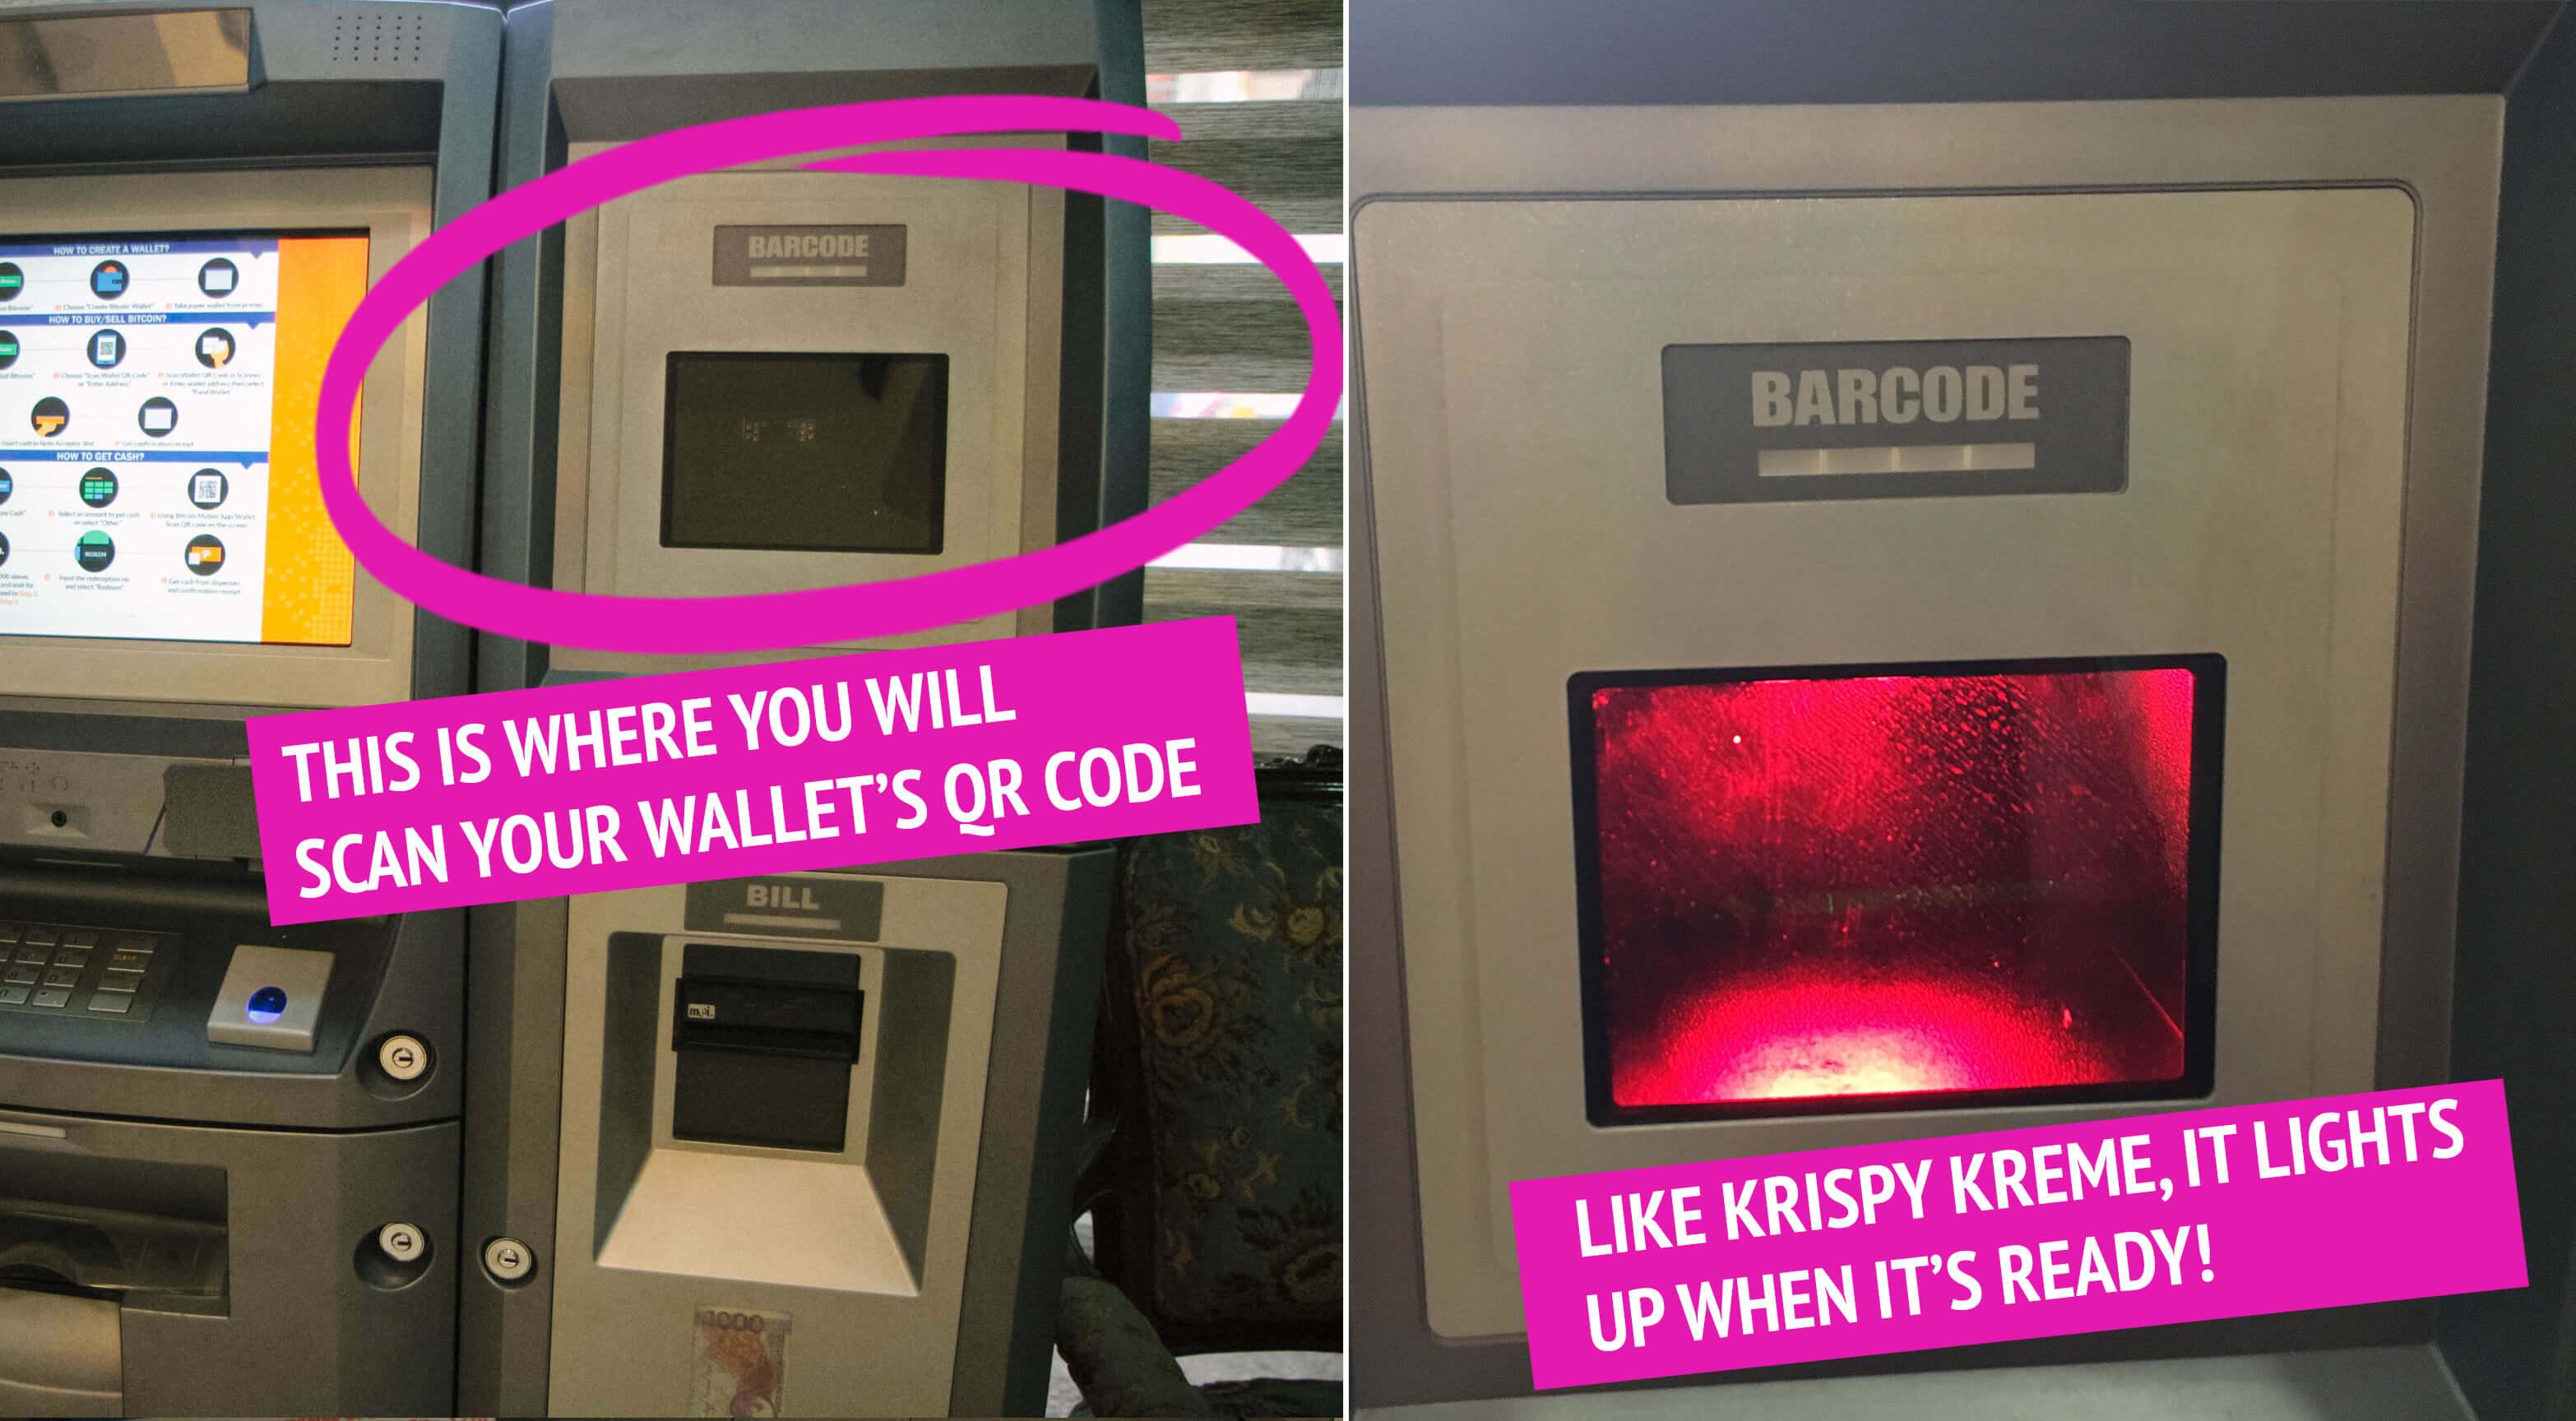 Scan QR Code Bitcoin ATM - A Pensive Peanut